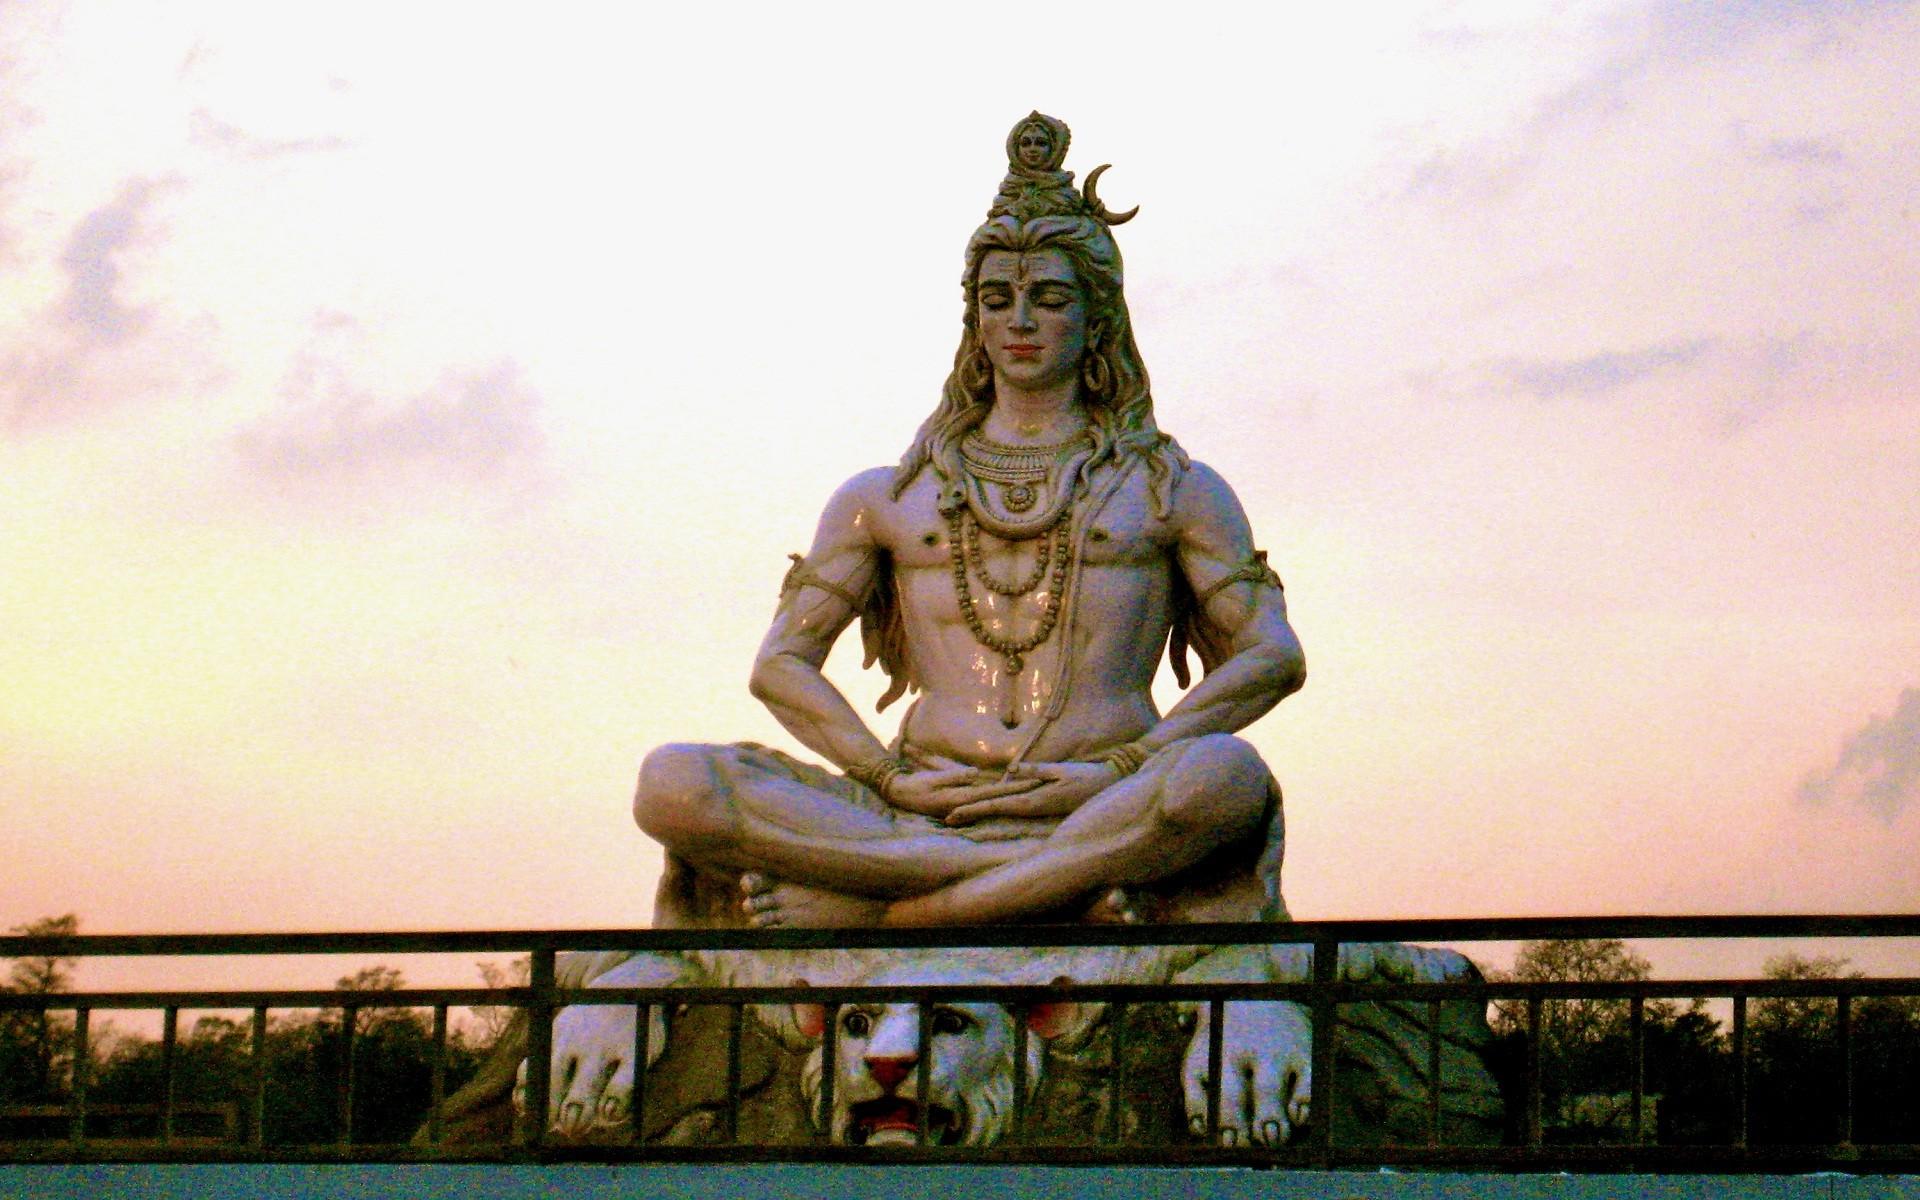 Most Inspiring Wallpaper High Quality Shiva - 441302  Image_344022.jpg